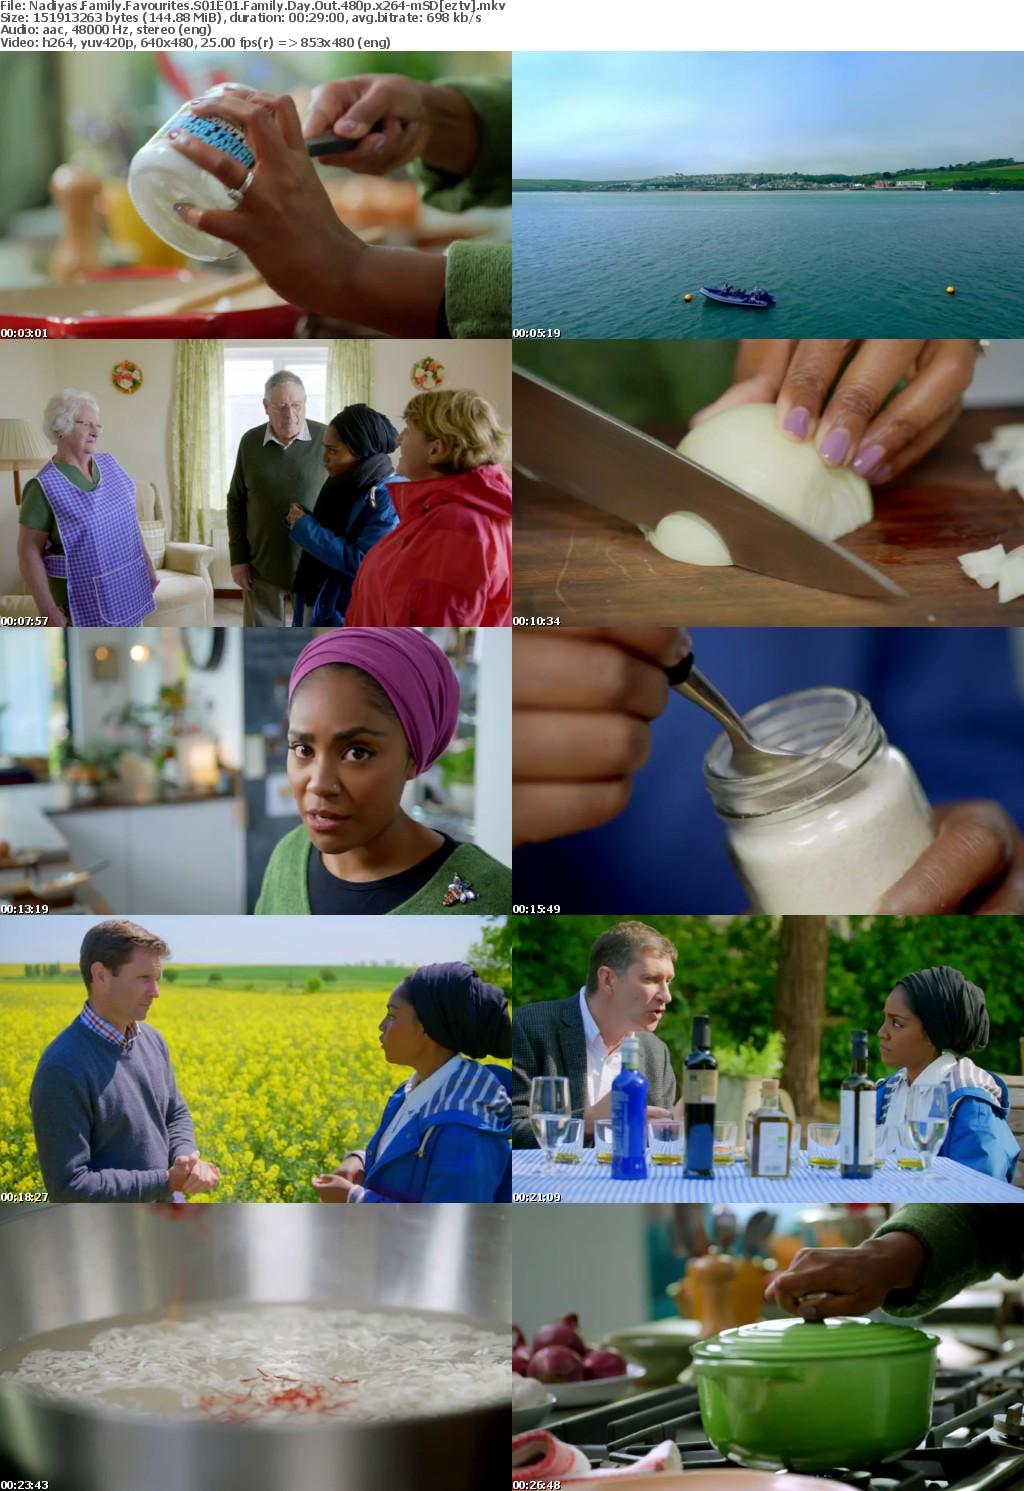 Nadiyas Family Favourites S01E01 Family Day Out 480p x264-mSD